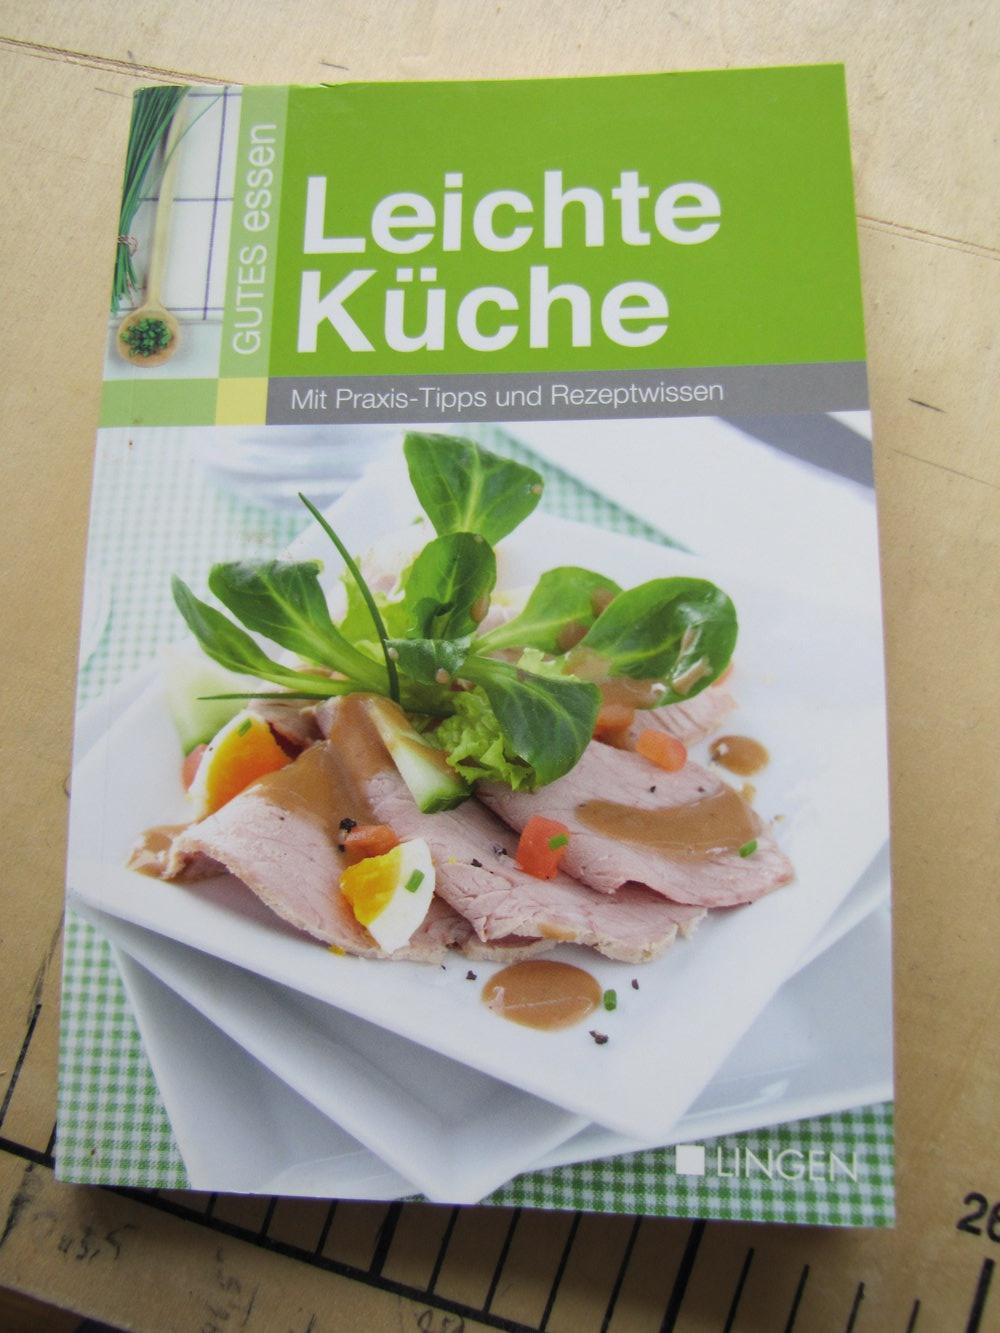 Stunning Experimente Aus Meiner Küche Ideas - Milbank.us - milbank.us